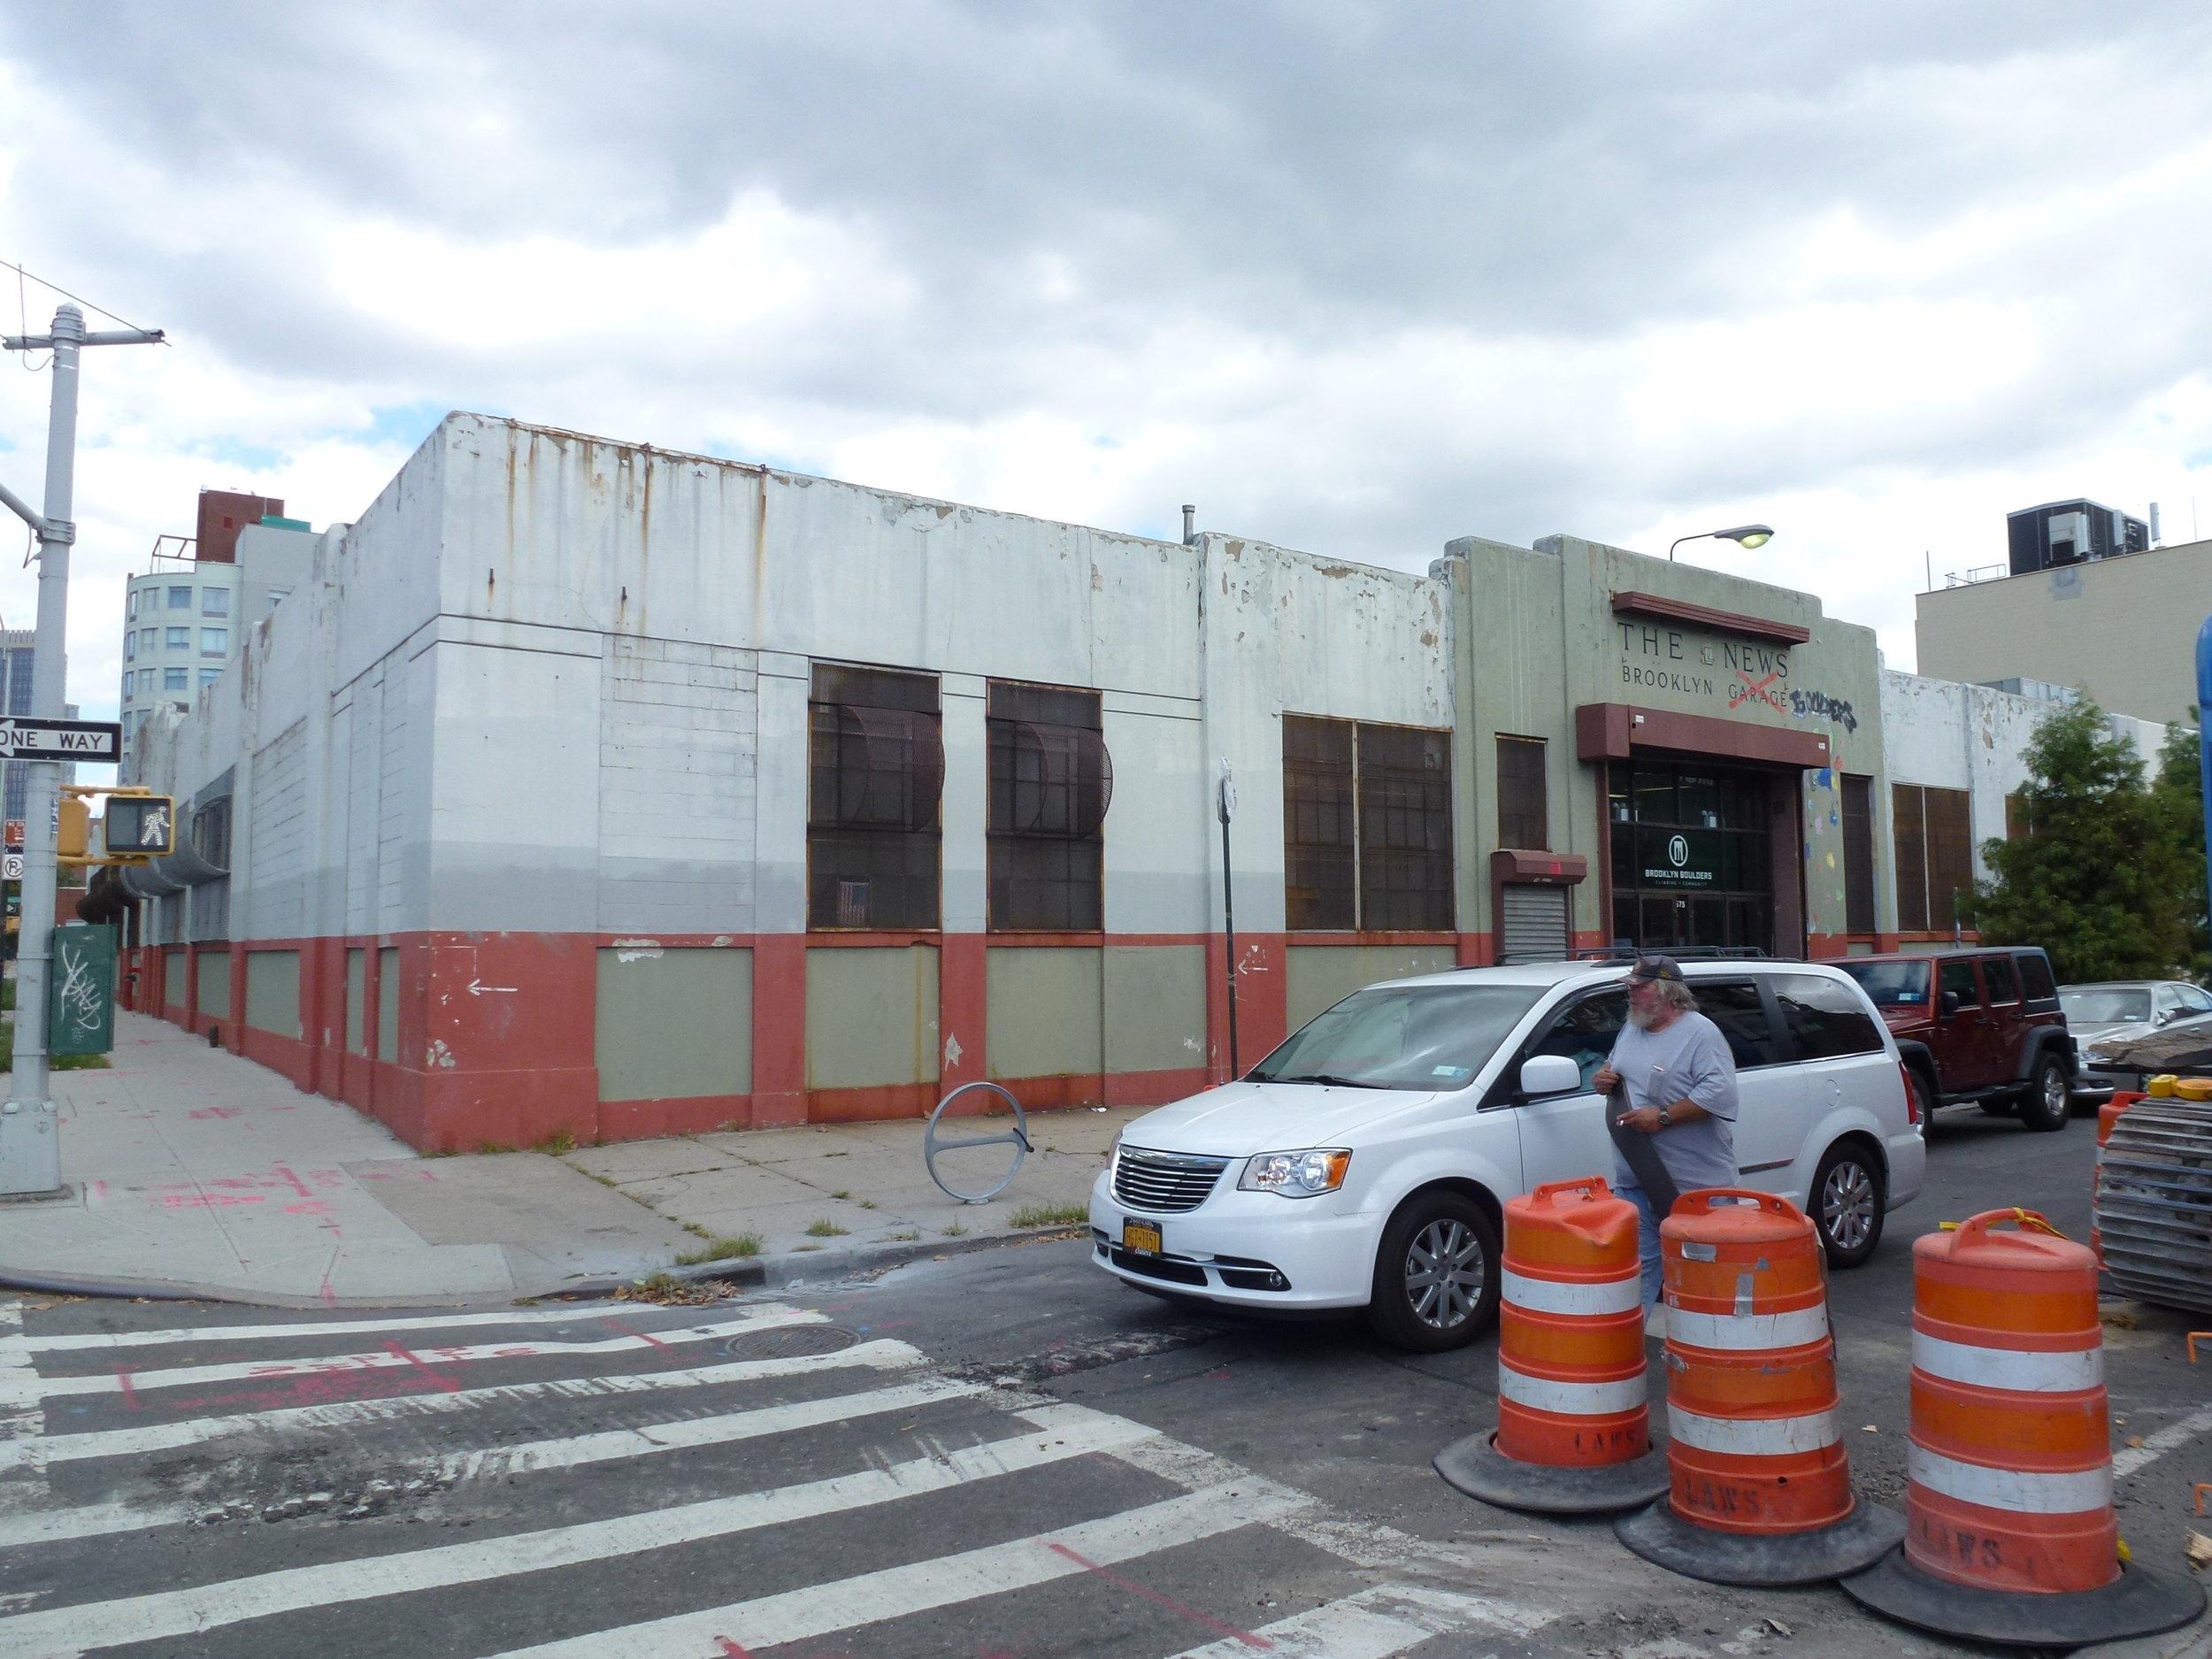 Brooklyn News Building, September 2016